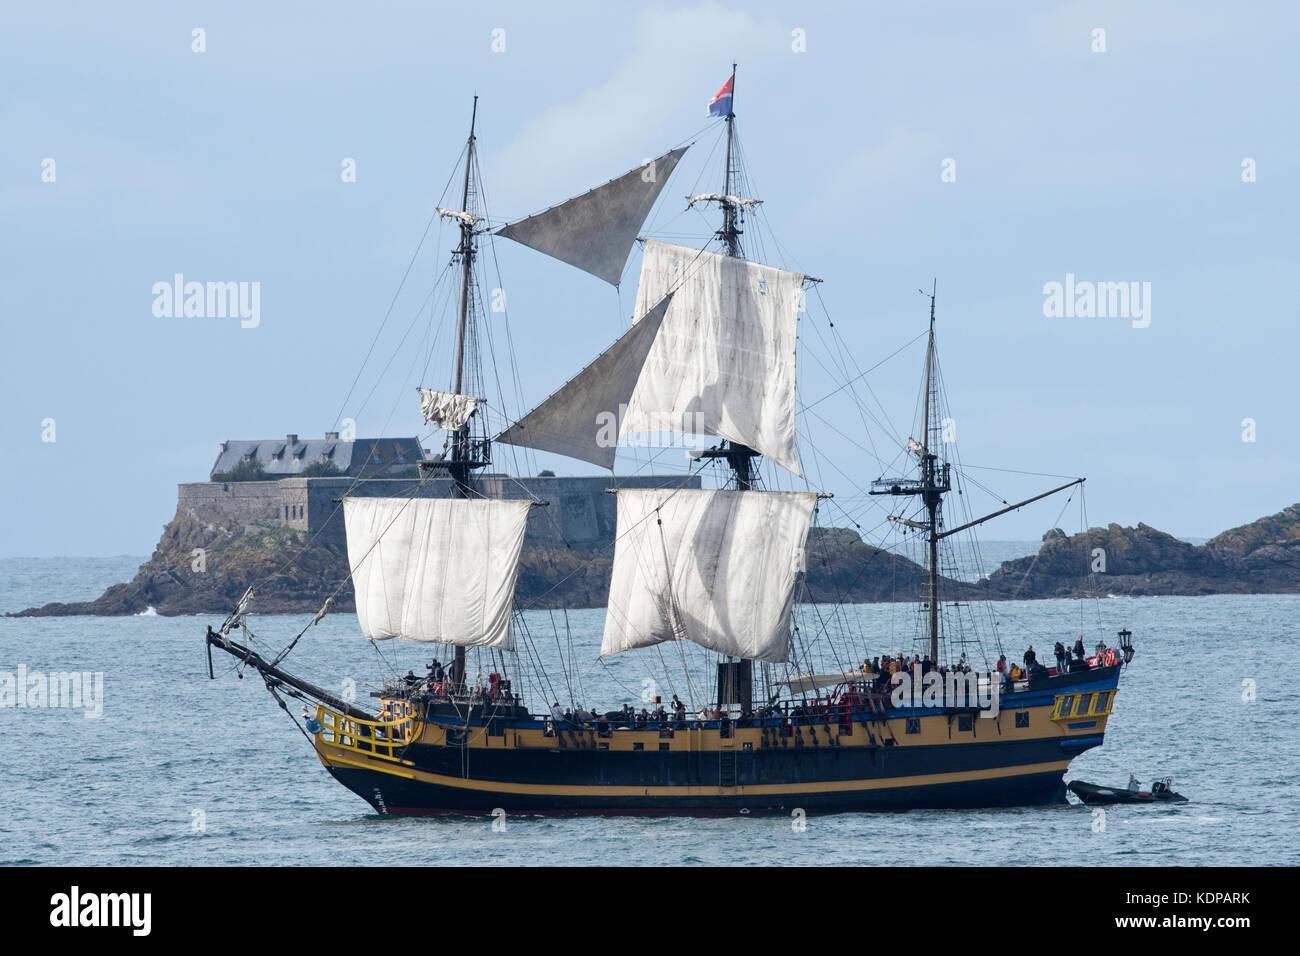 Etoile du Roy three masted frigate sails in to St Malo. - Stock Image